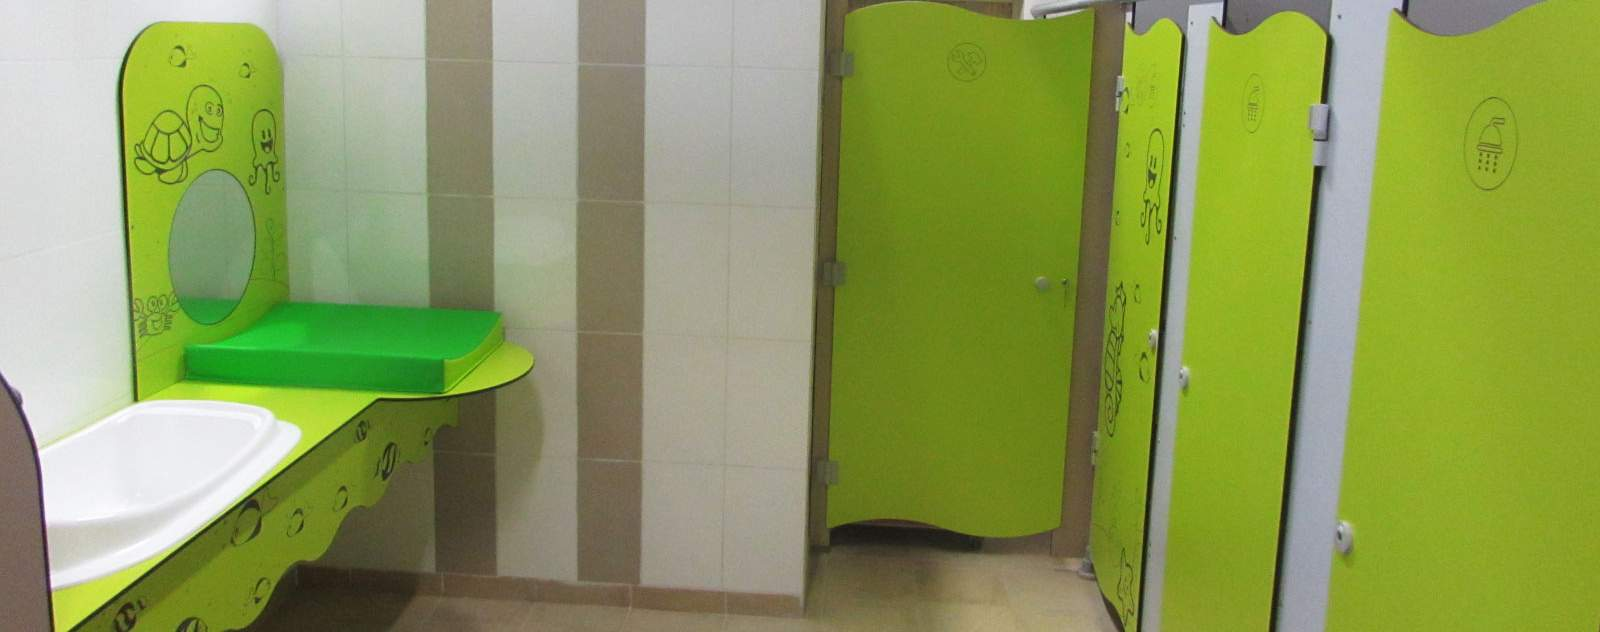 sanitaire espace famille